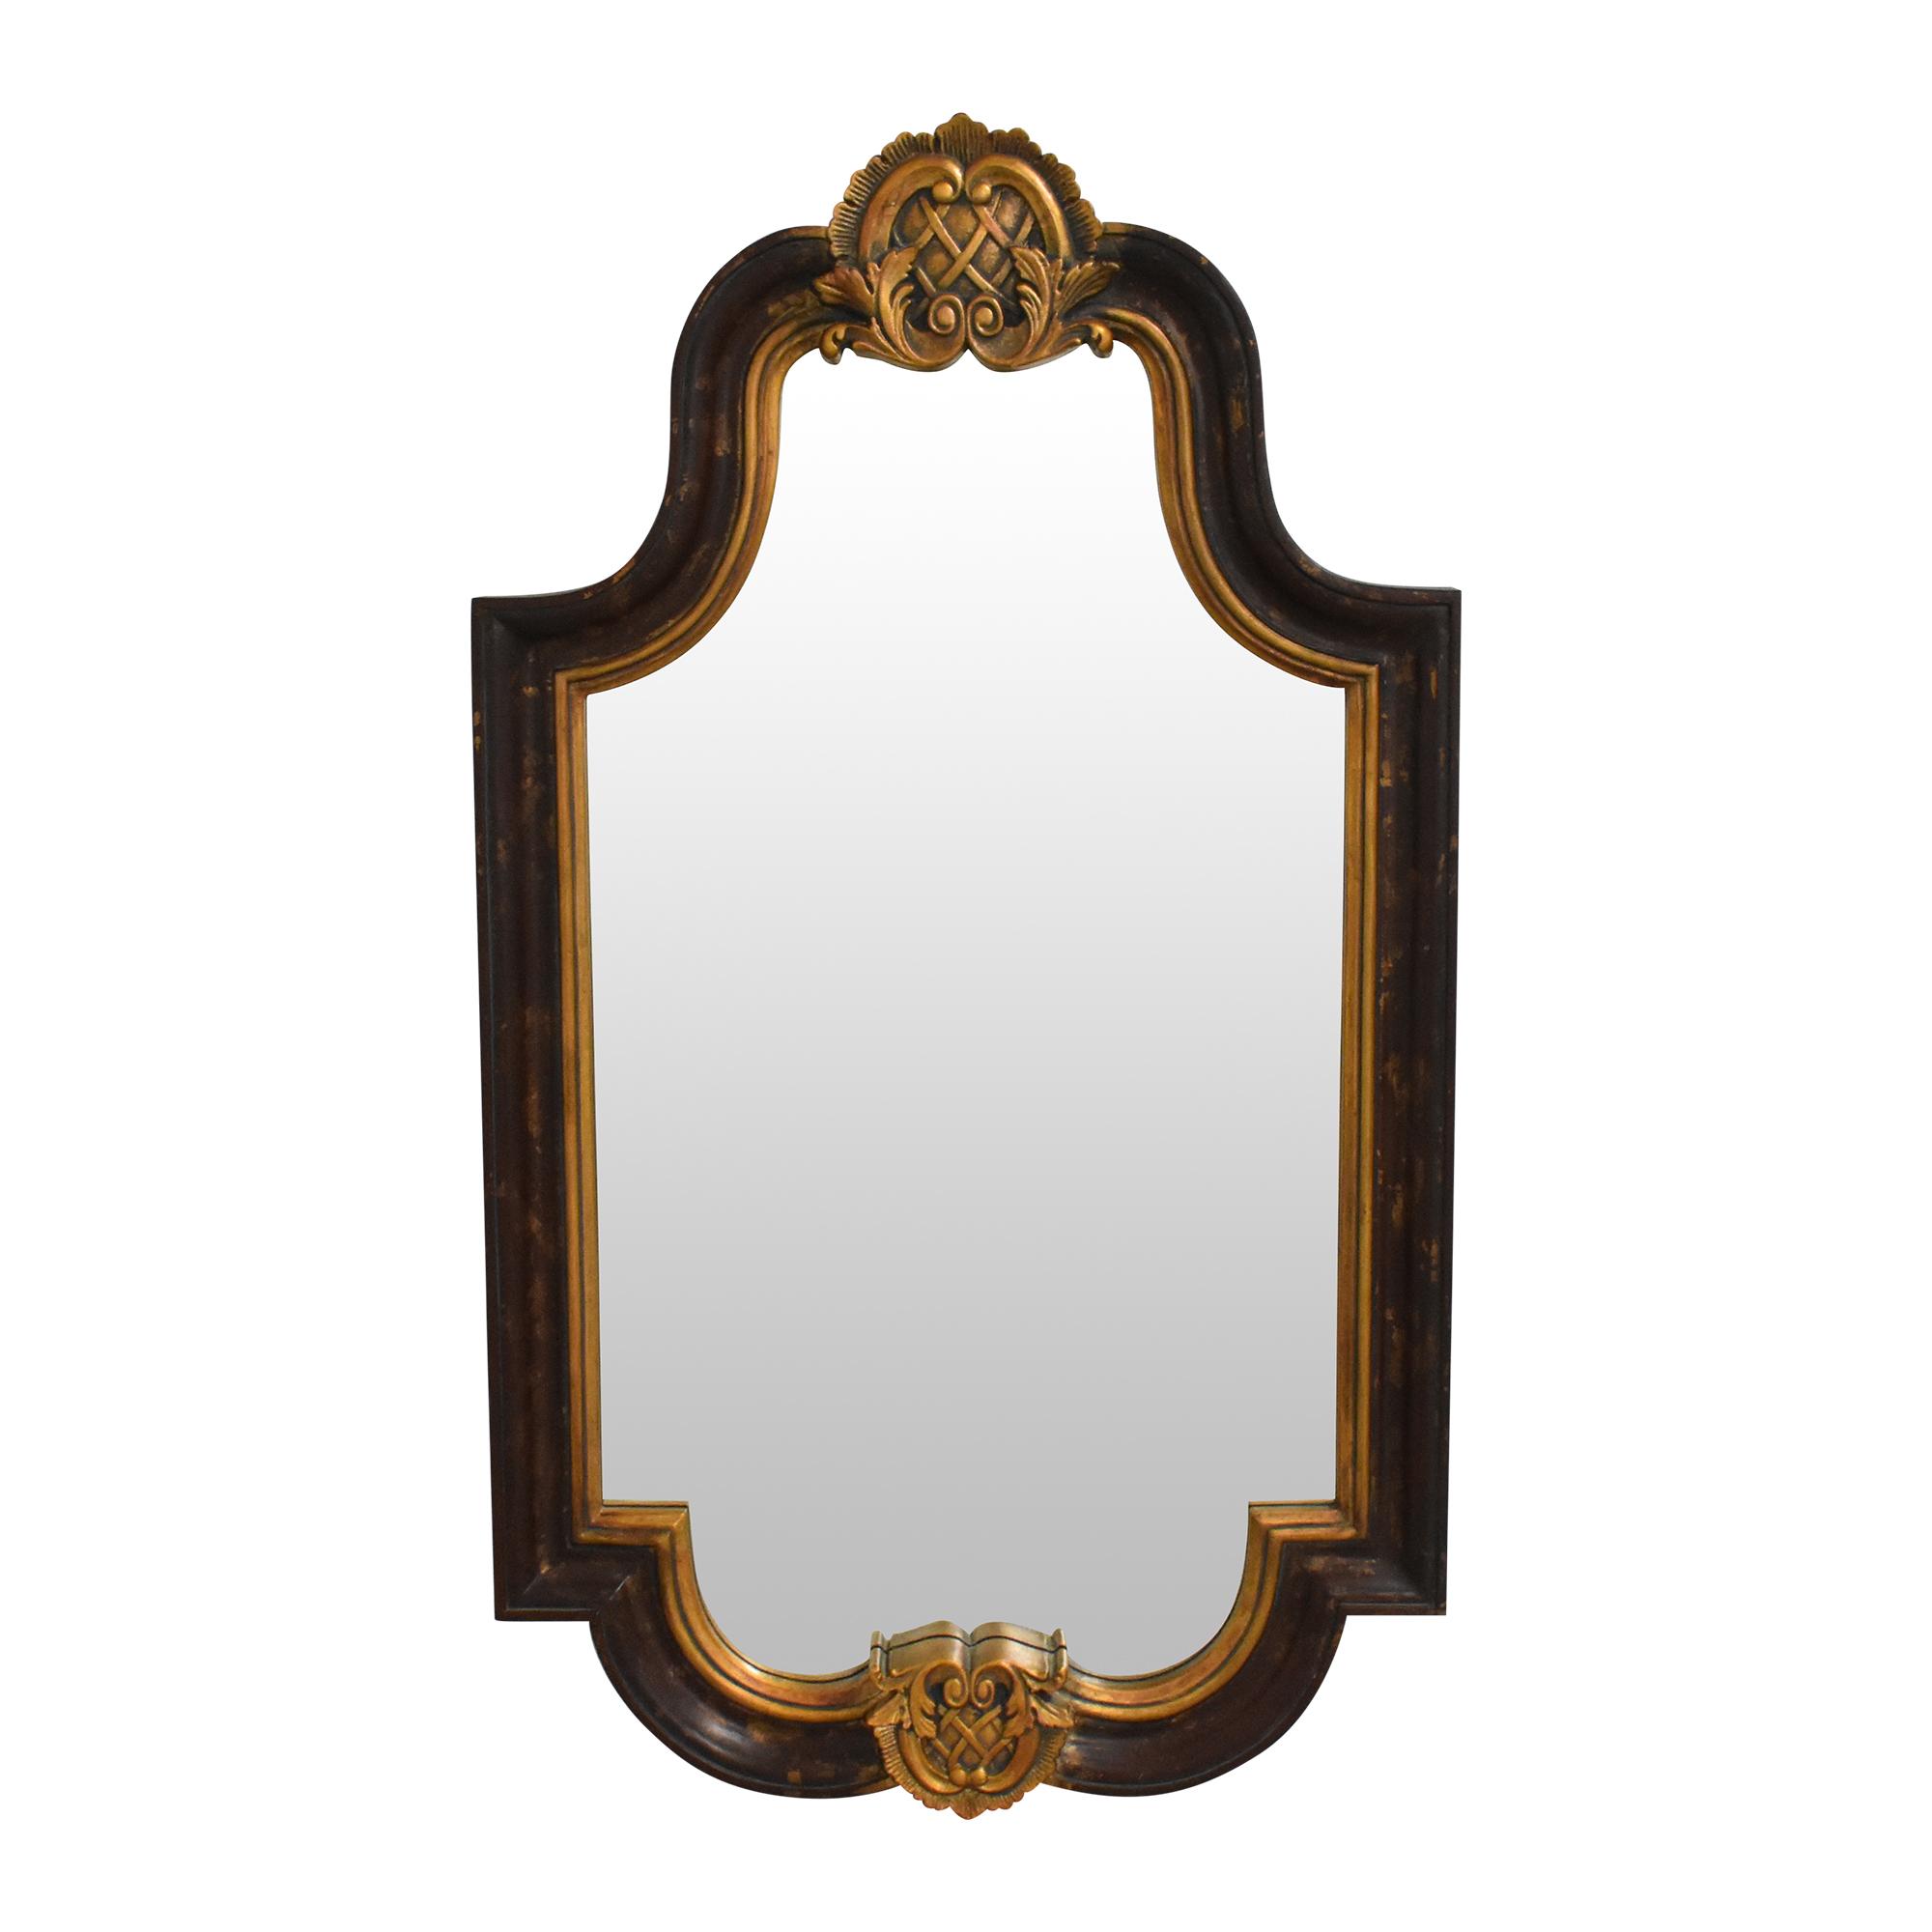 Bombay Company Crest Mirror / Decor